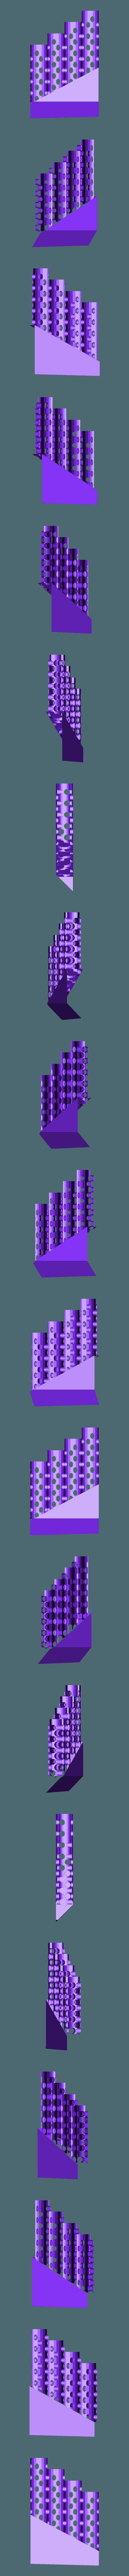 Quad_Ex_Pipes_R.stl Download free STL file Gaslands Greebles (Blowers and Burners) • Design to 3D print, Ellie_Valkyrie